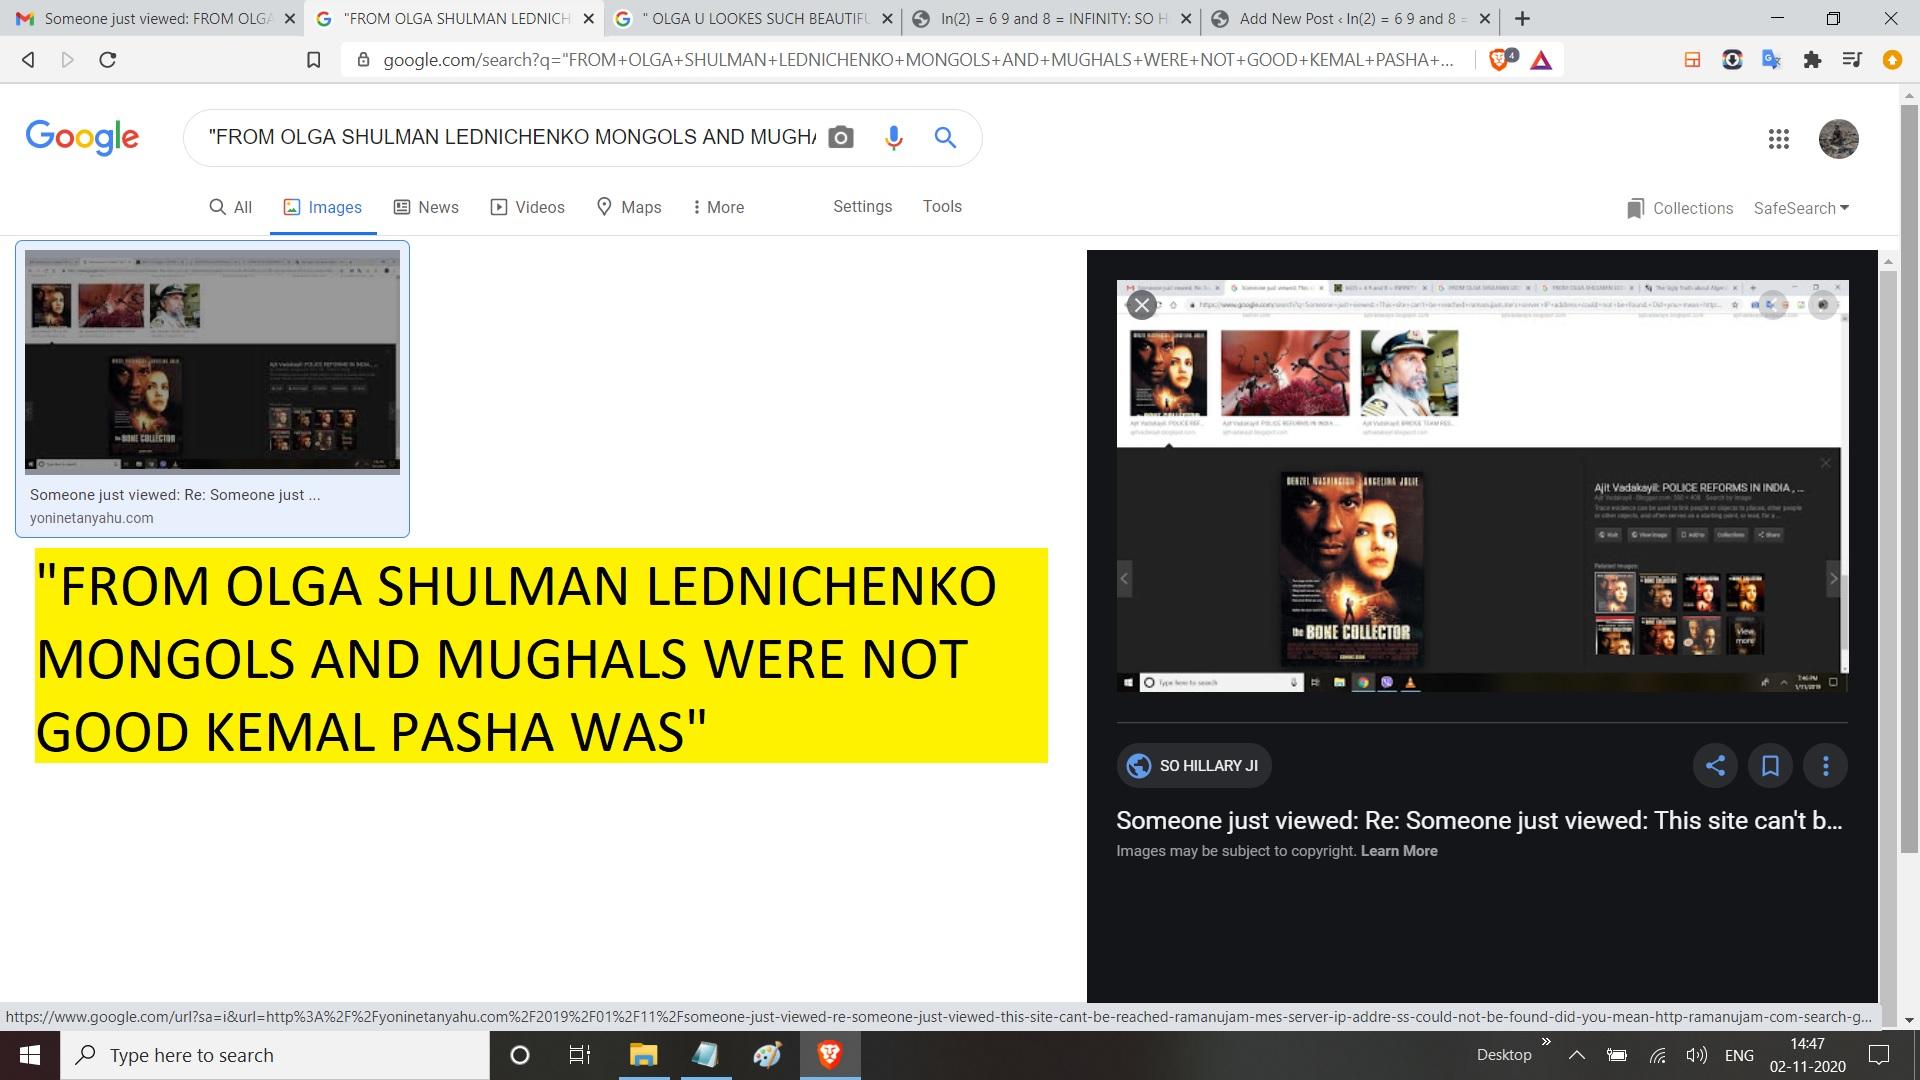 FROM OLGA SHULMAN LEDNICHENKO MONGOLS AND MUGHALS WERE NOT GOOD KEMAL PASHA WAS